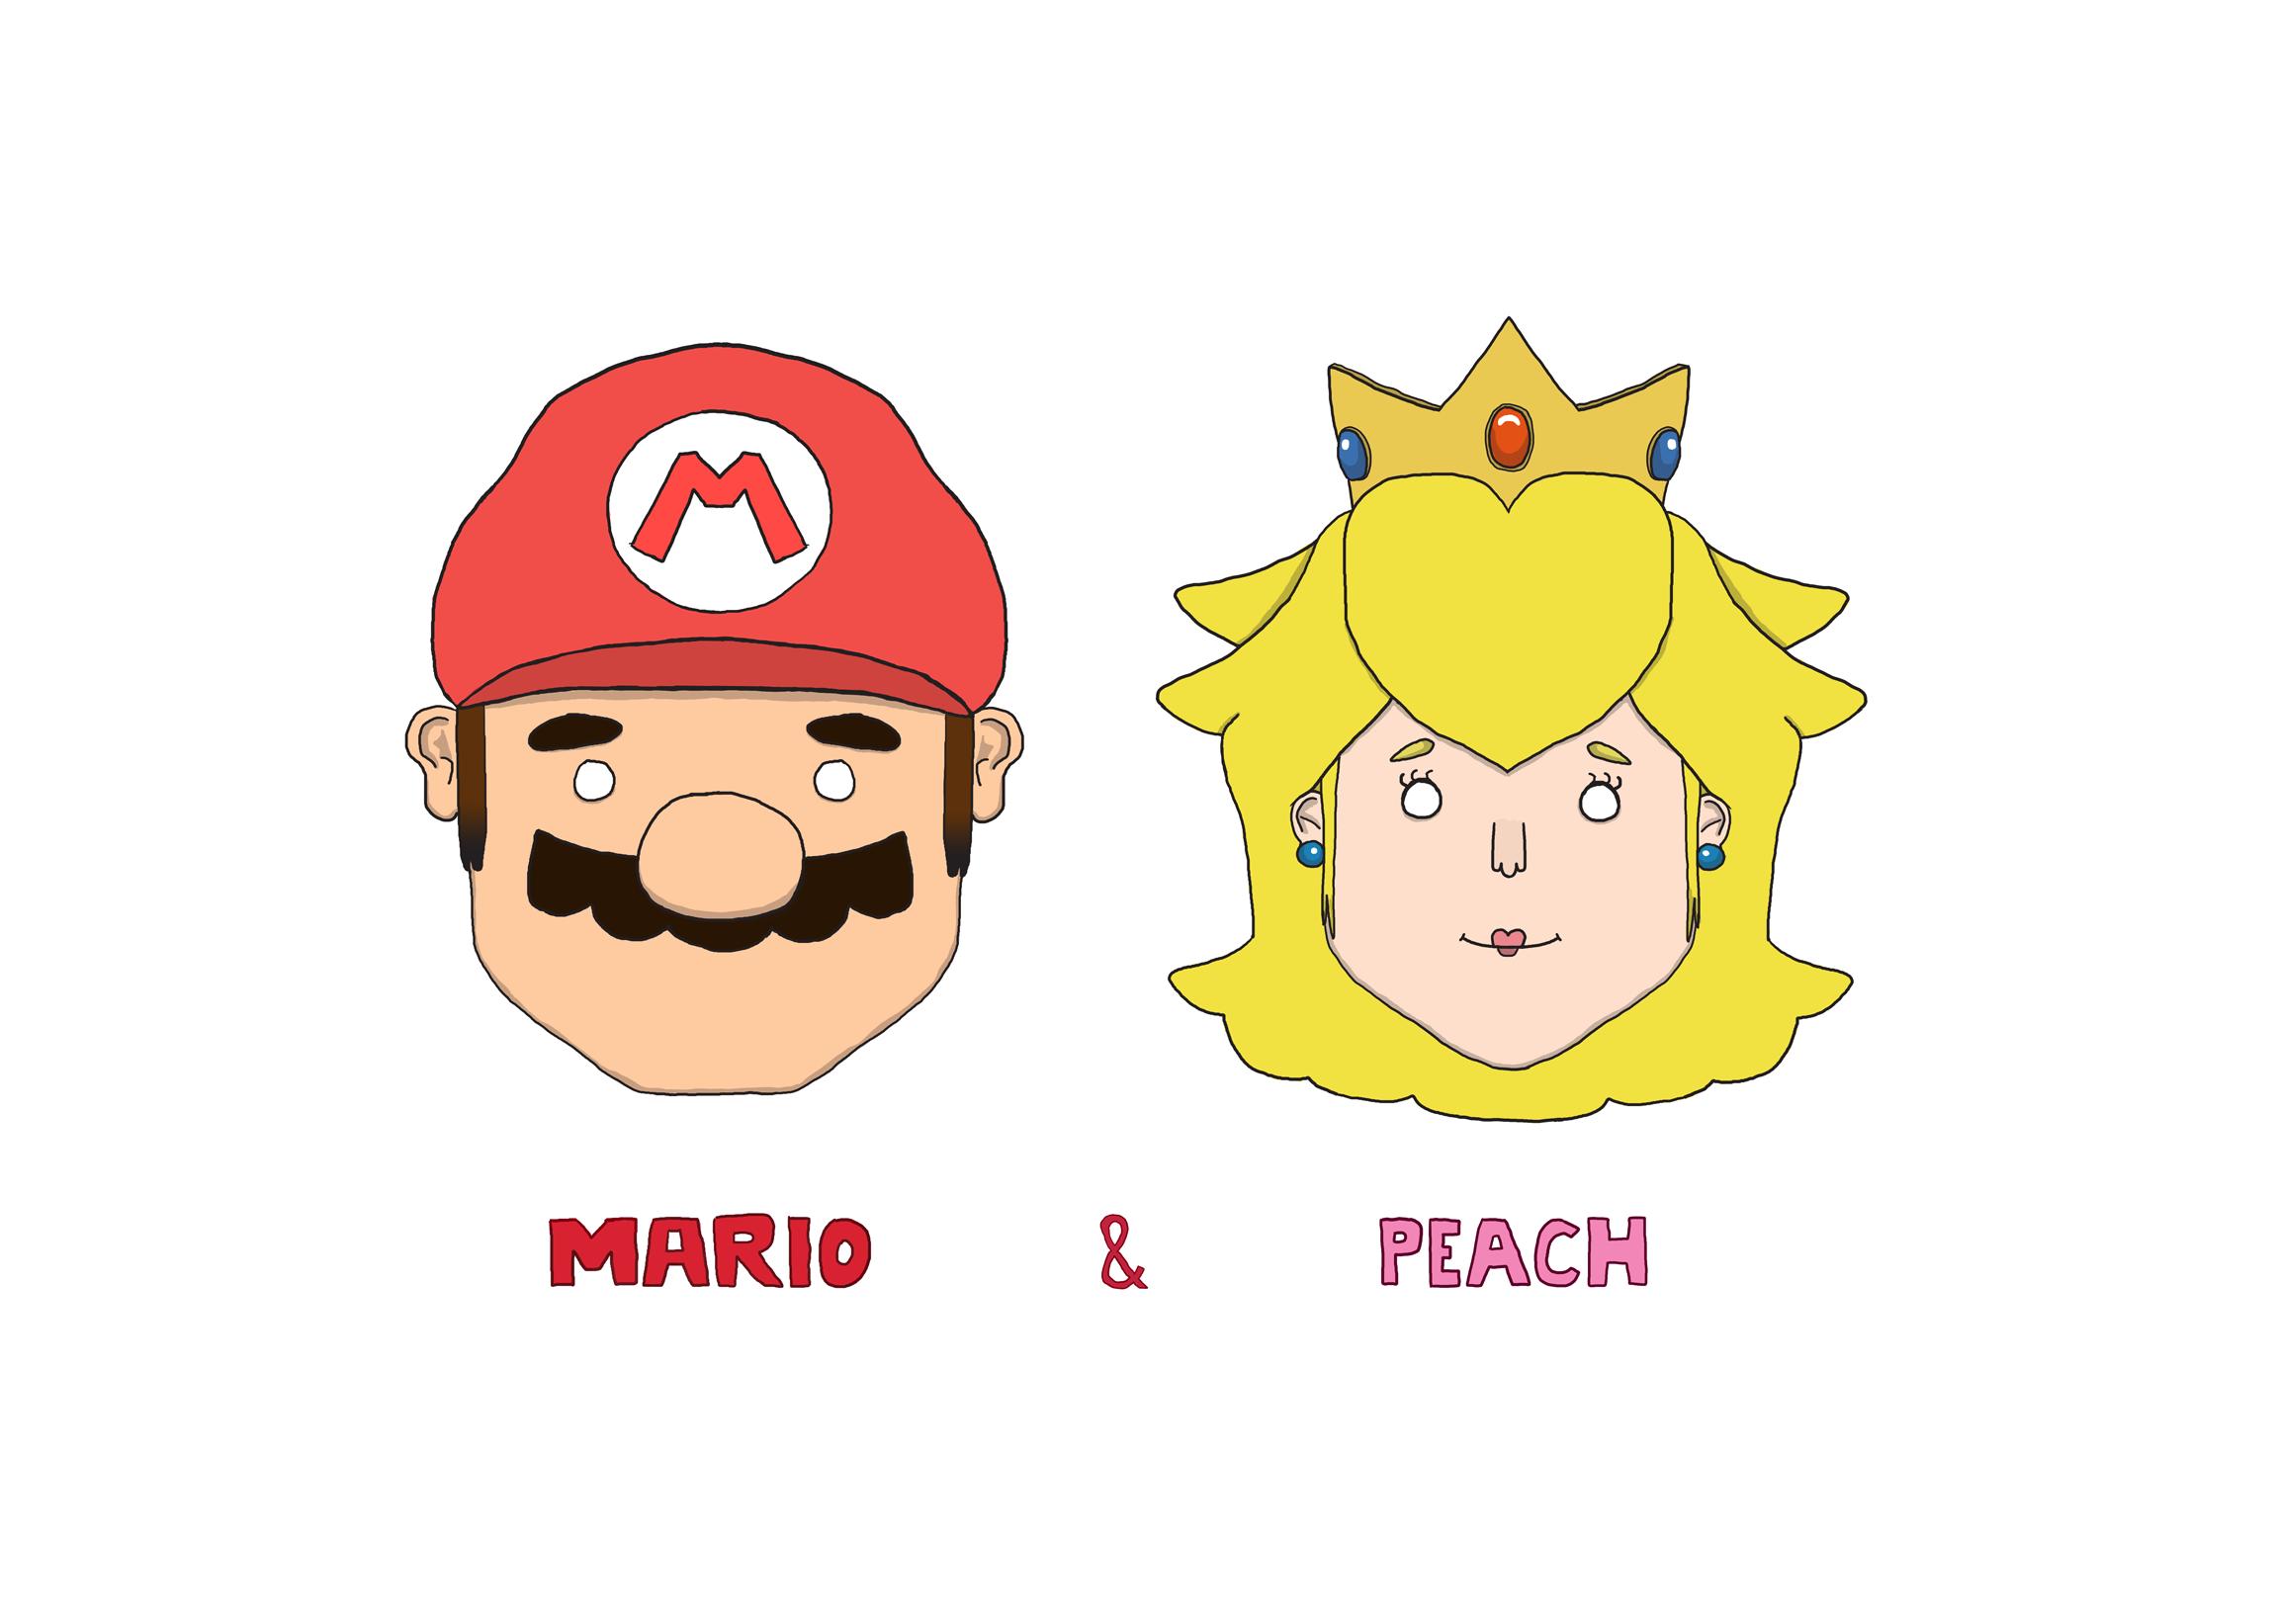 Mario and Peach